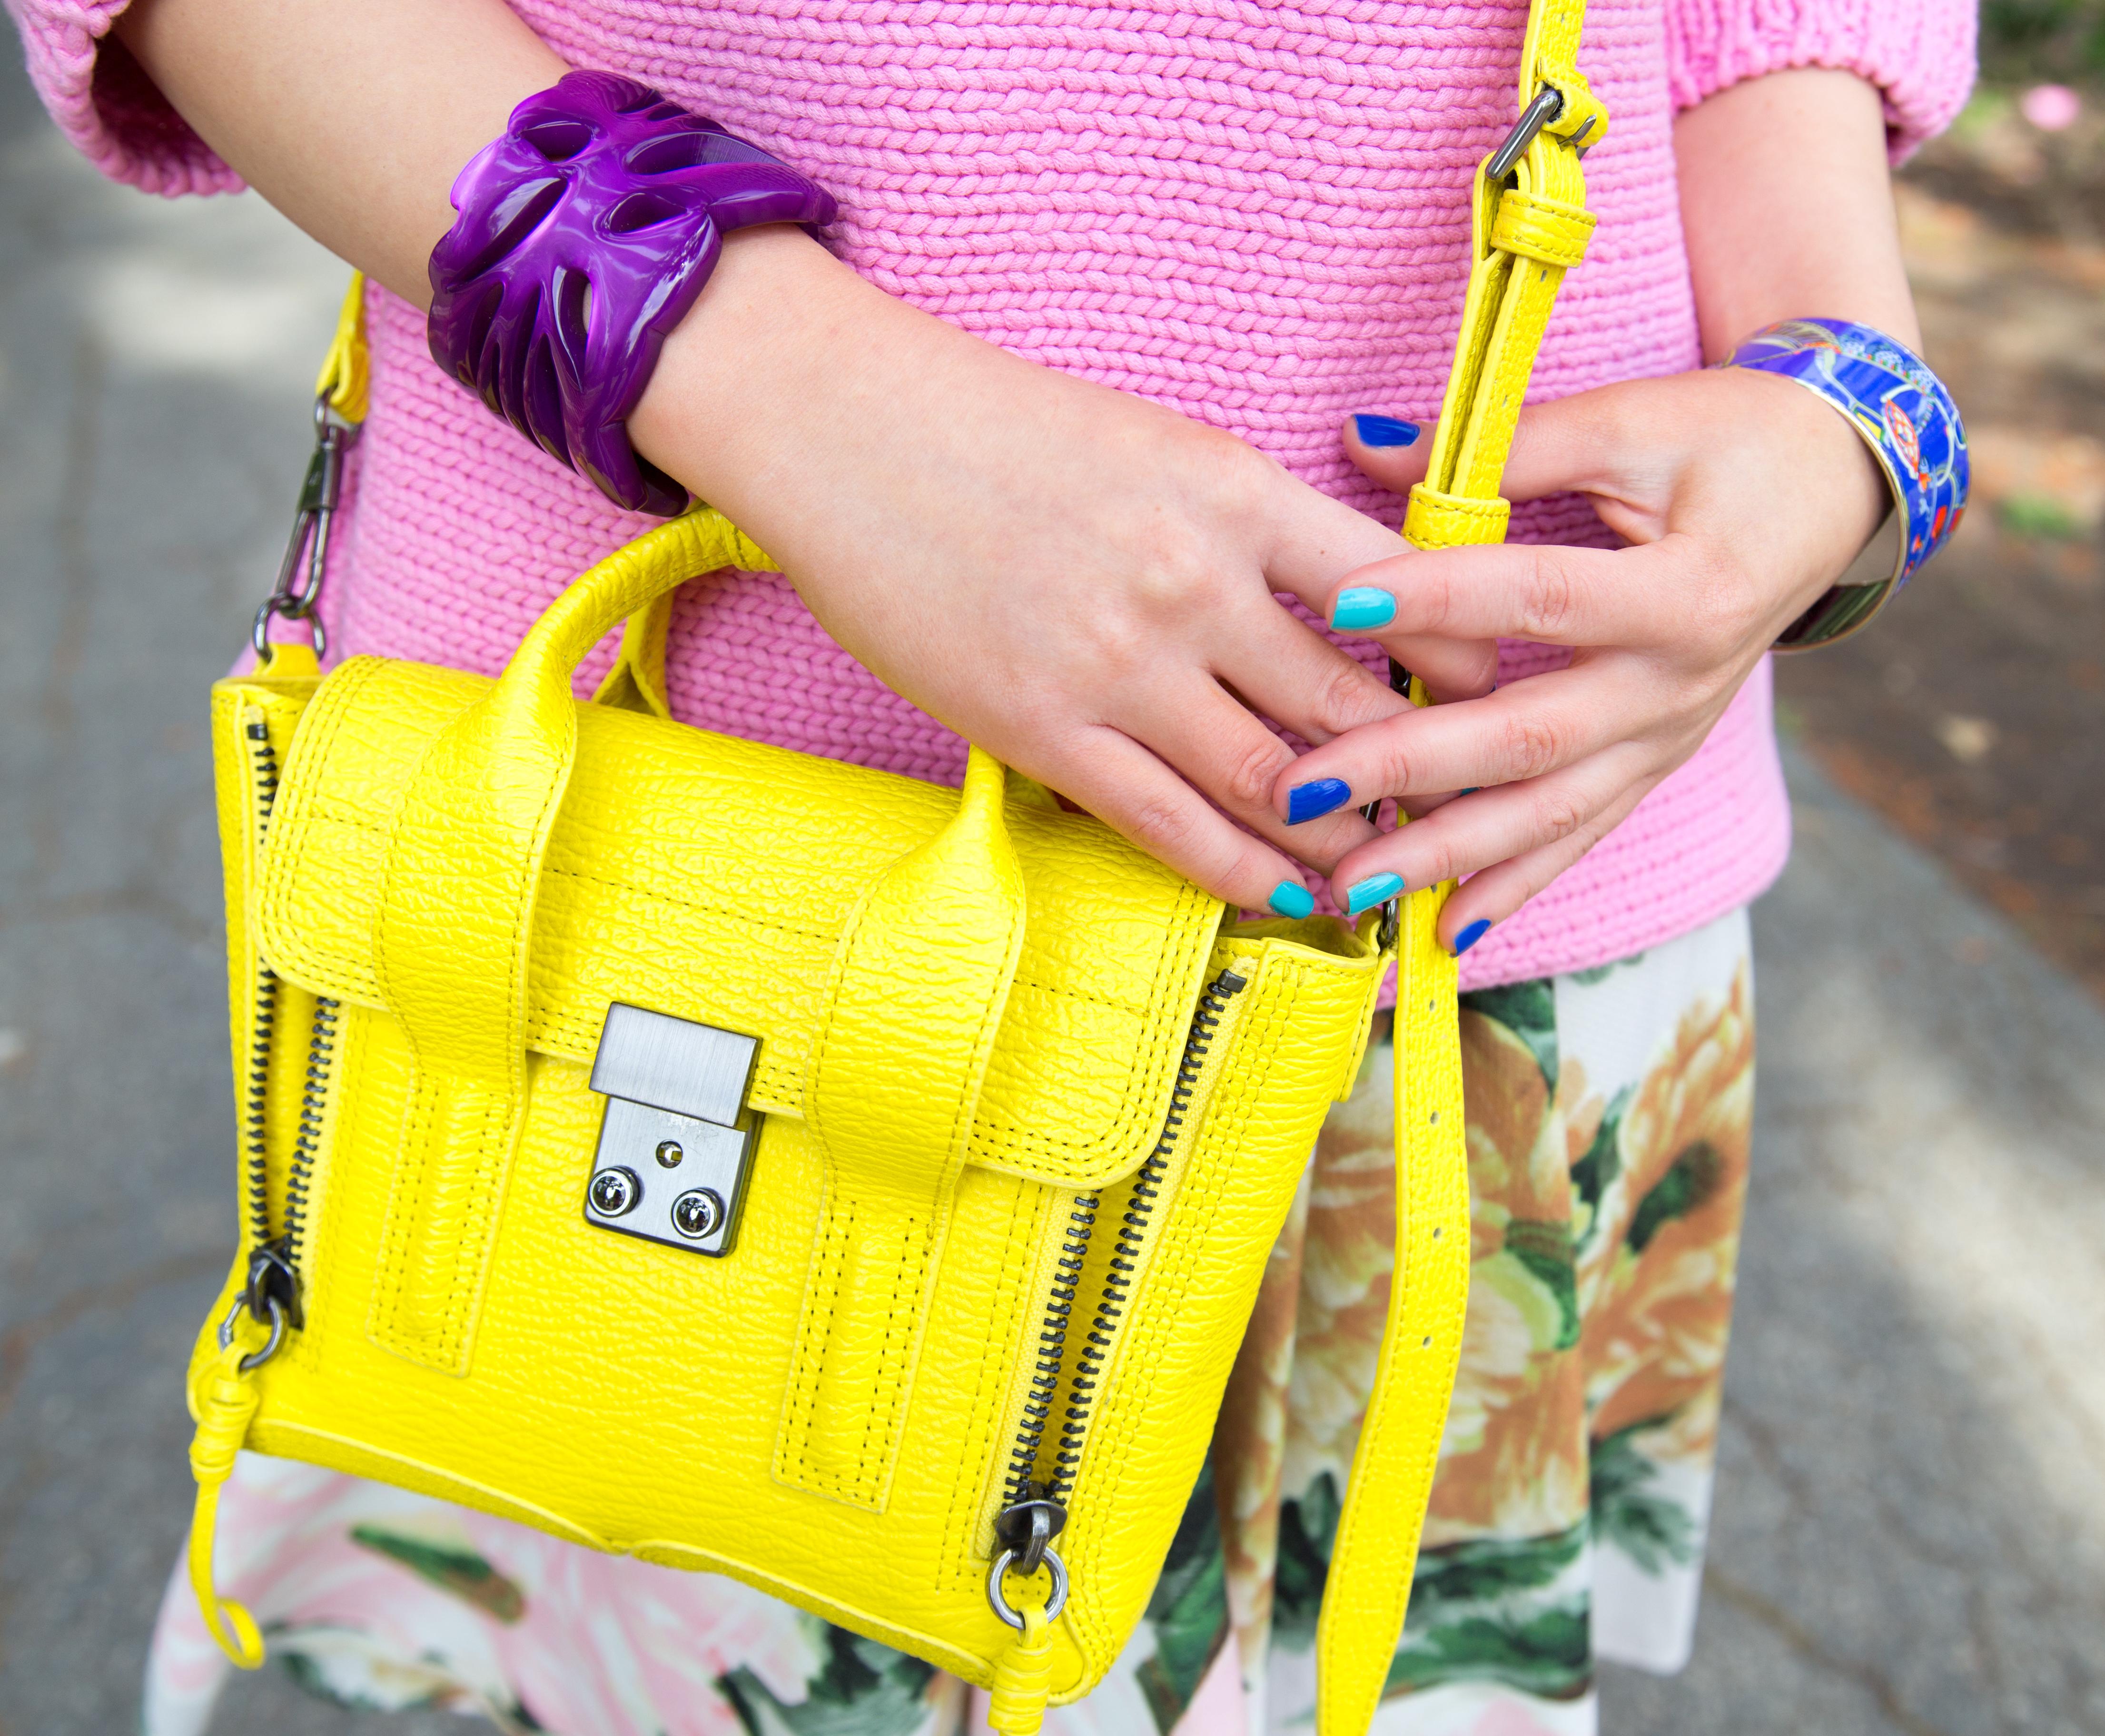 blue nails,yellow bag,neon bag,nail art,yellow and purple,pashli mini